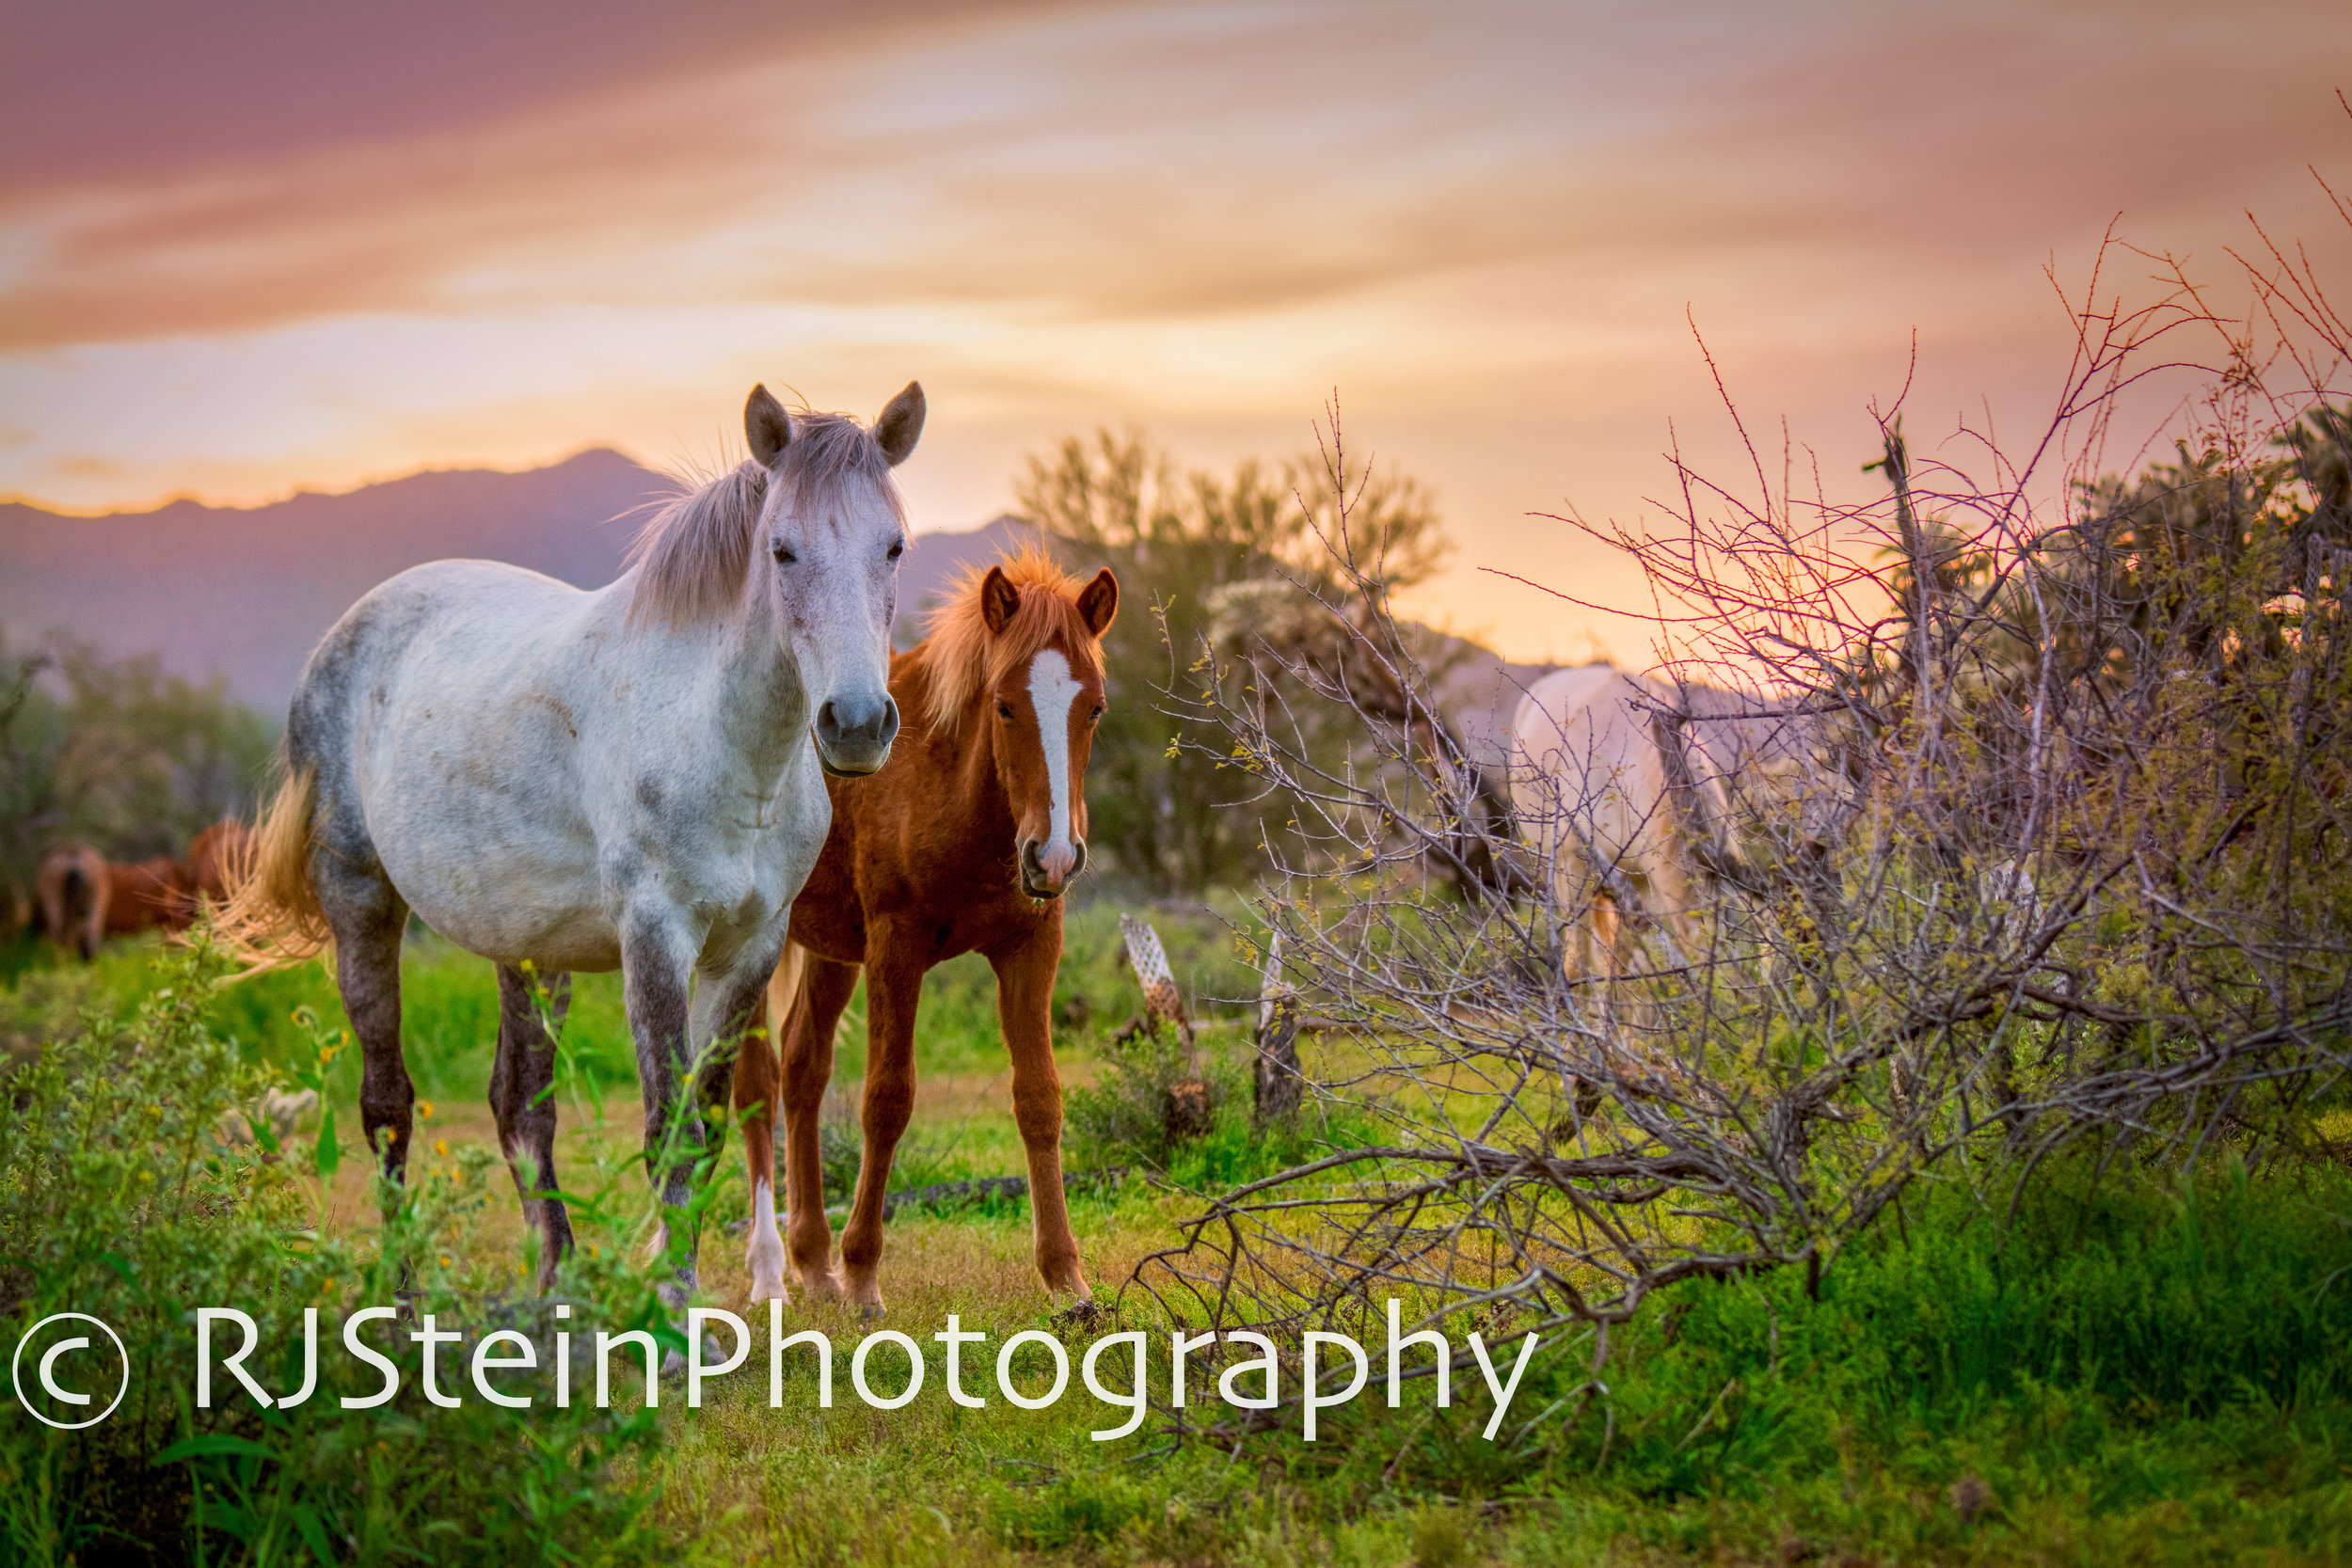 sunset in the desert, arizona, 2019